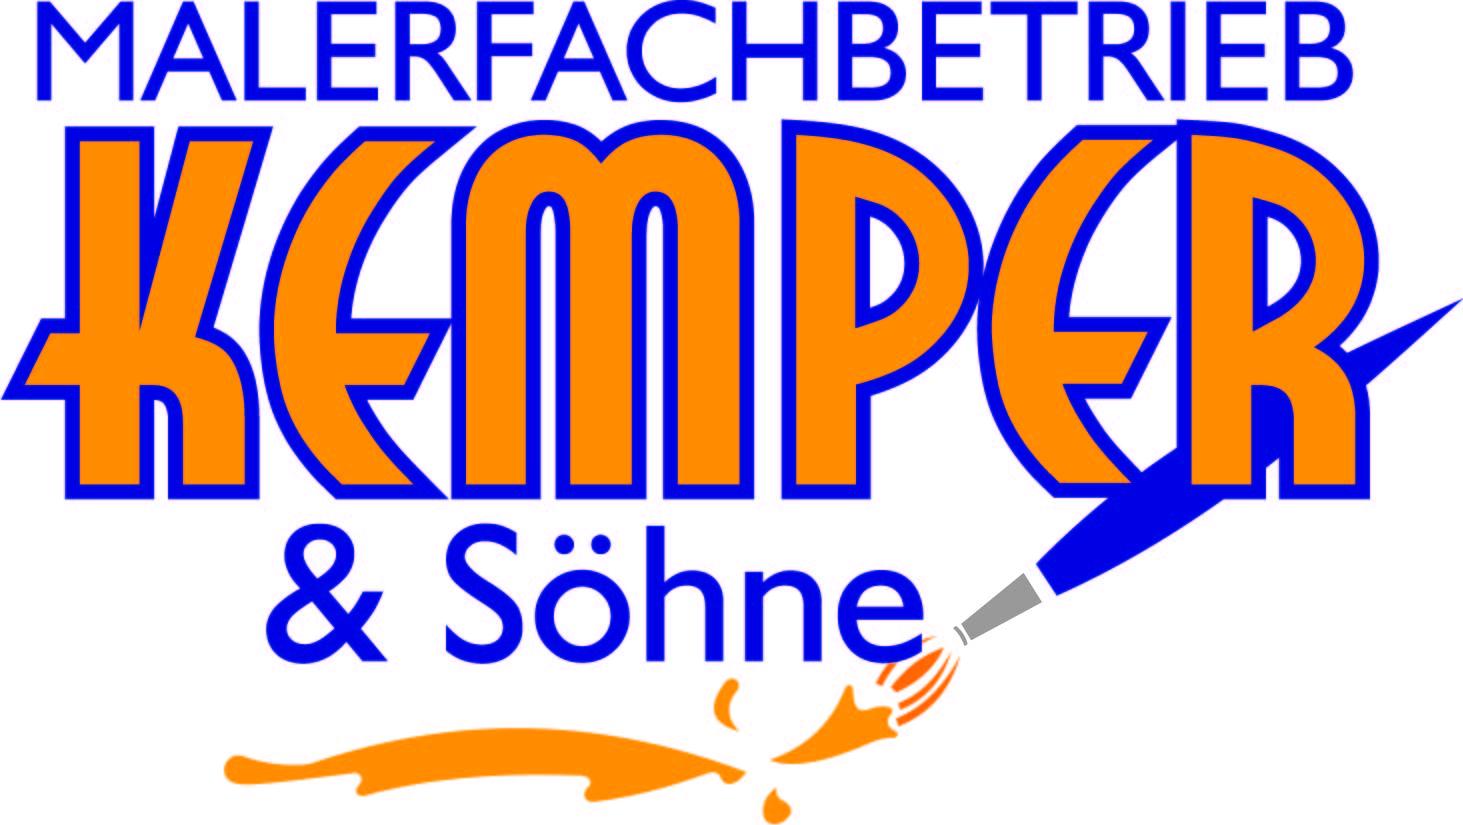 Malerbetrieb Kemper